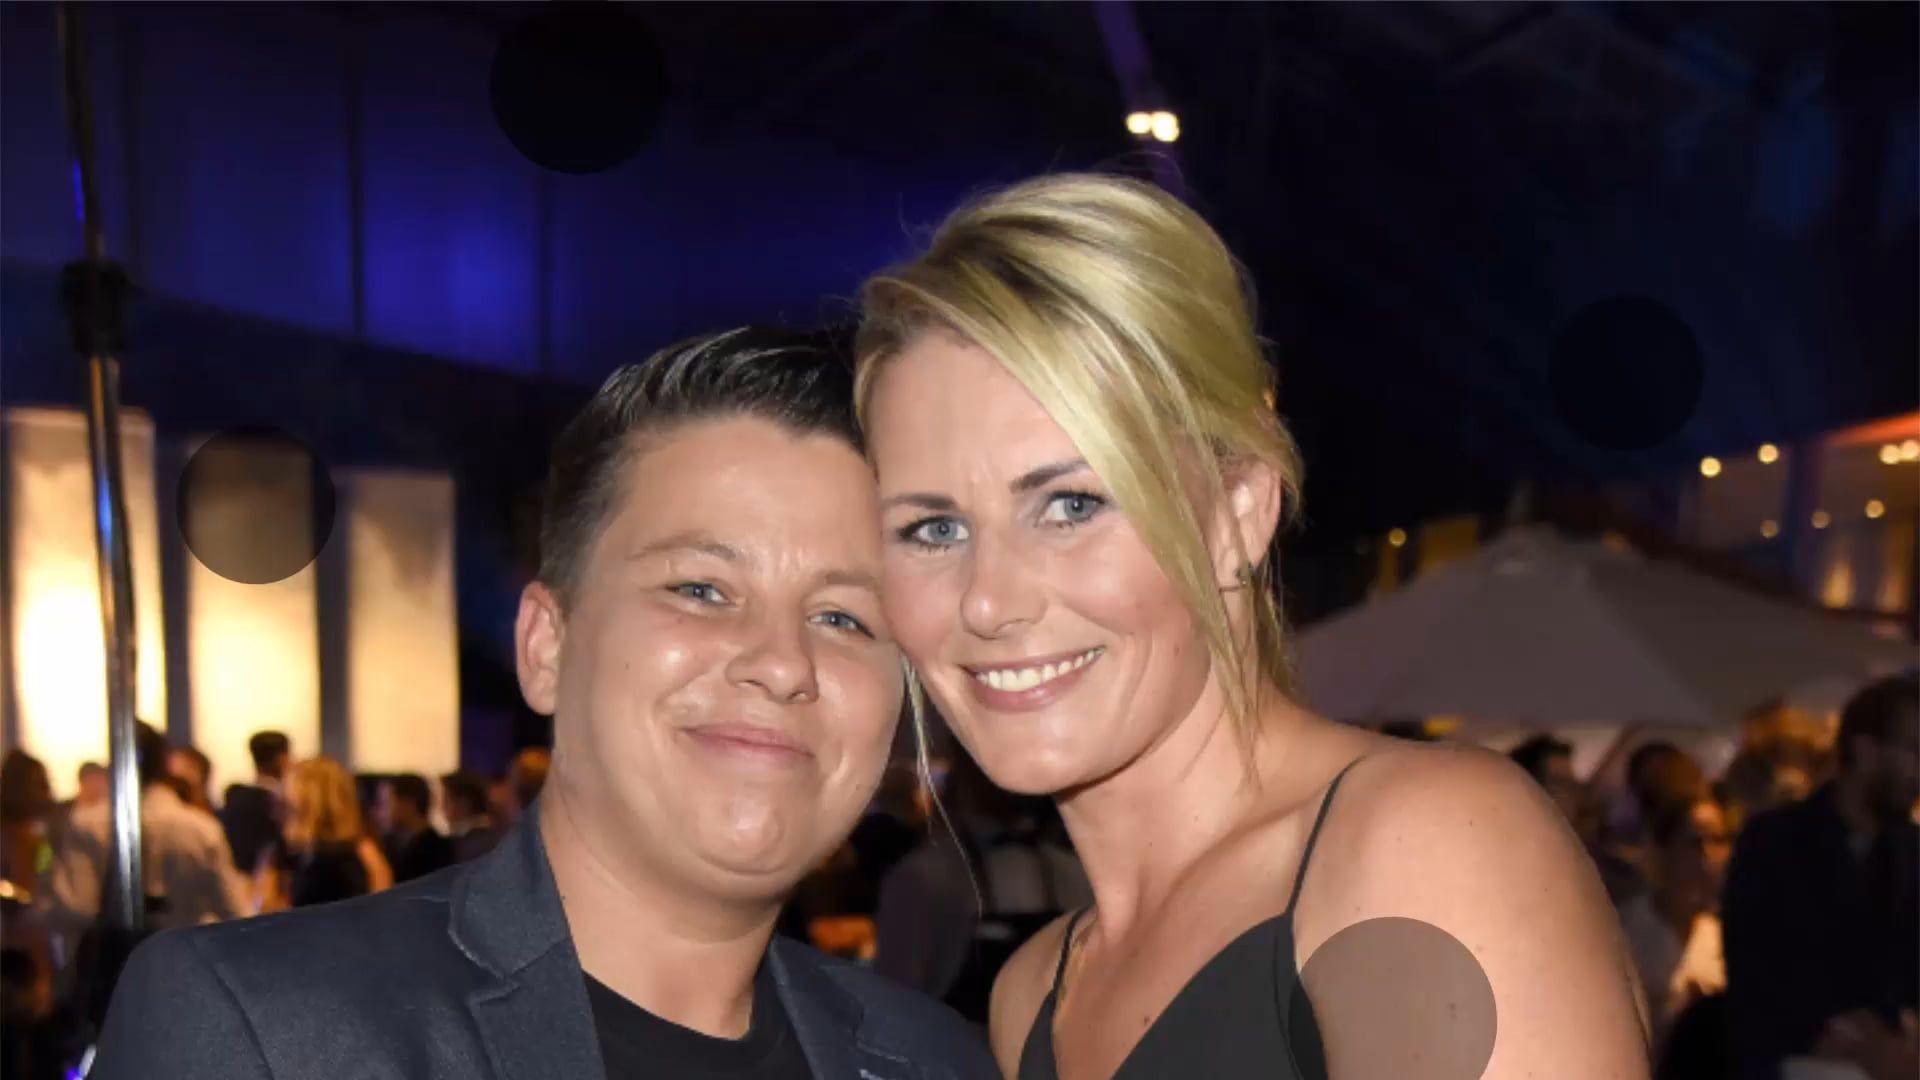 Let's dance | Kerstin Ott: Das ist ihre Frau Karolina Köppen